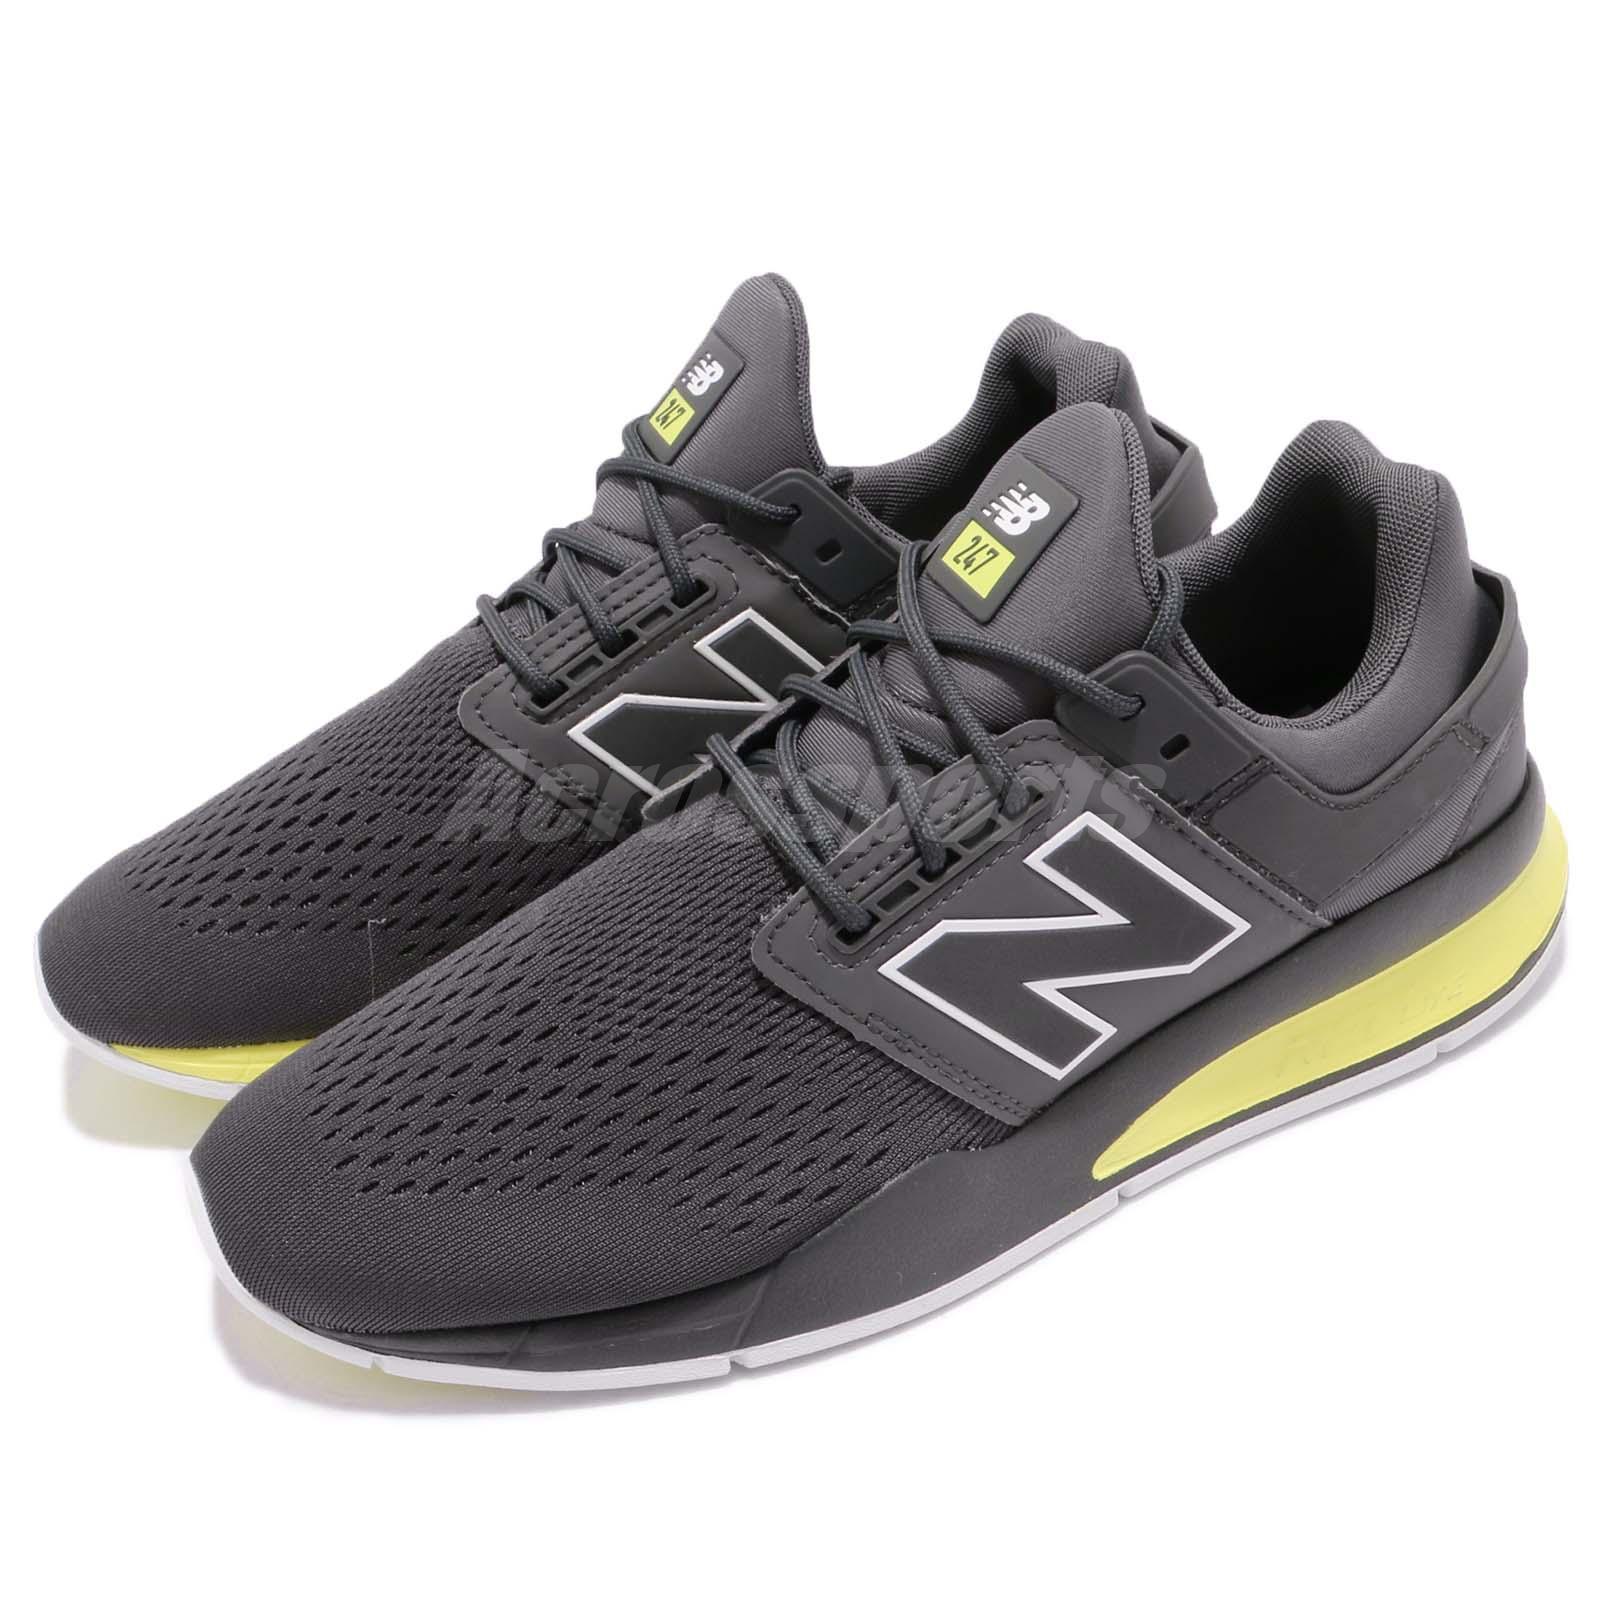 New Balance MS247TG D Grey Yellow Men